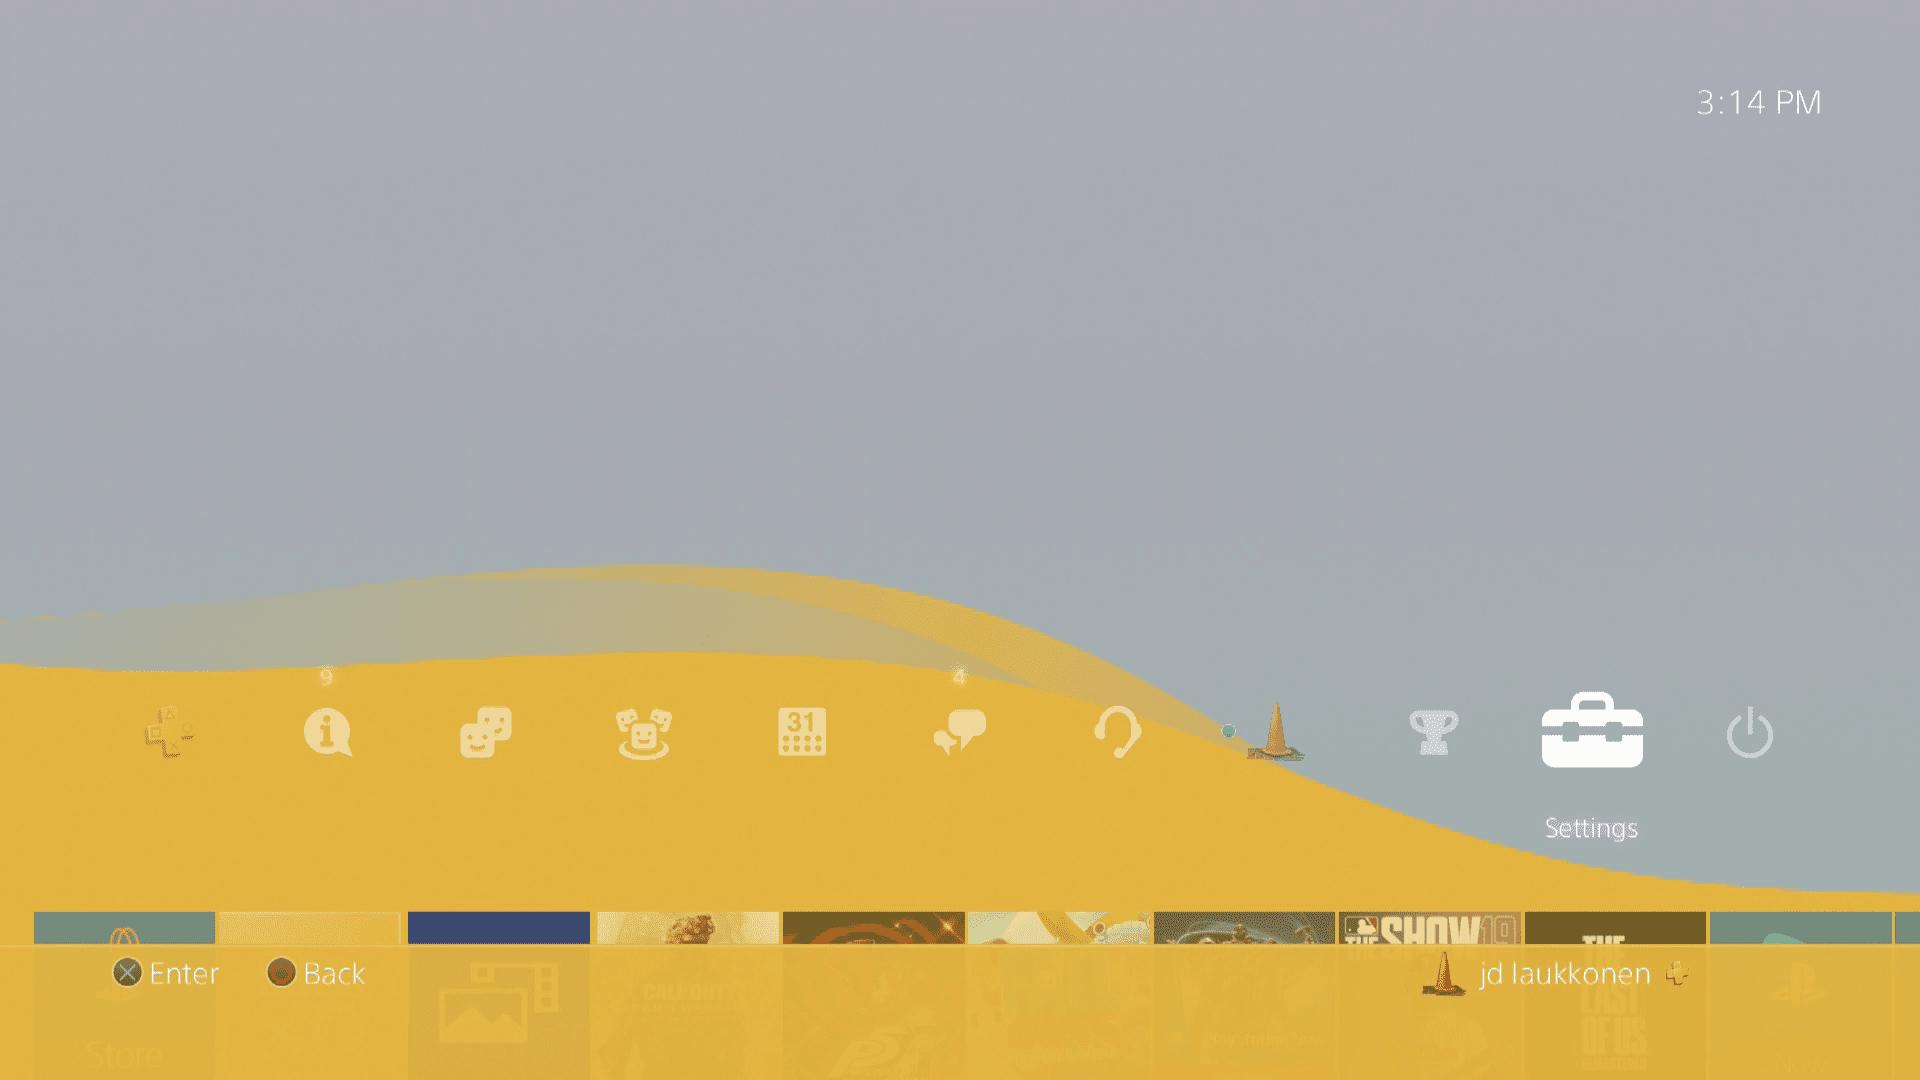 A screenshot of the main PS4 menu.